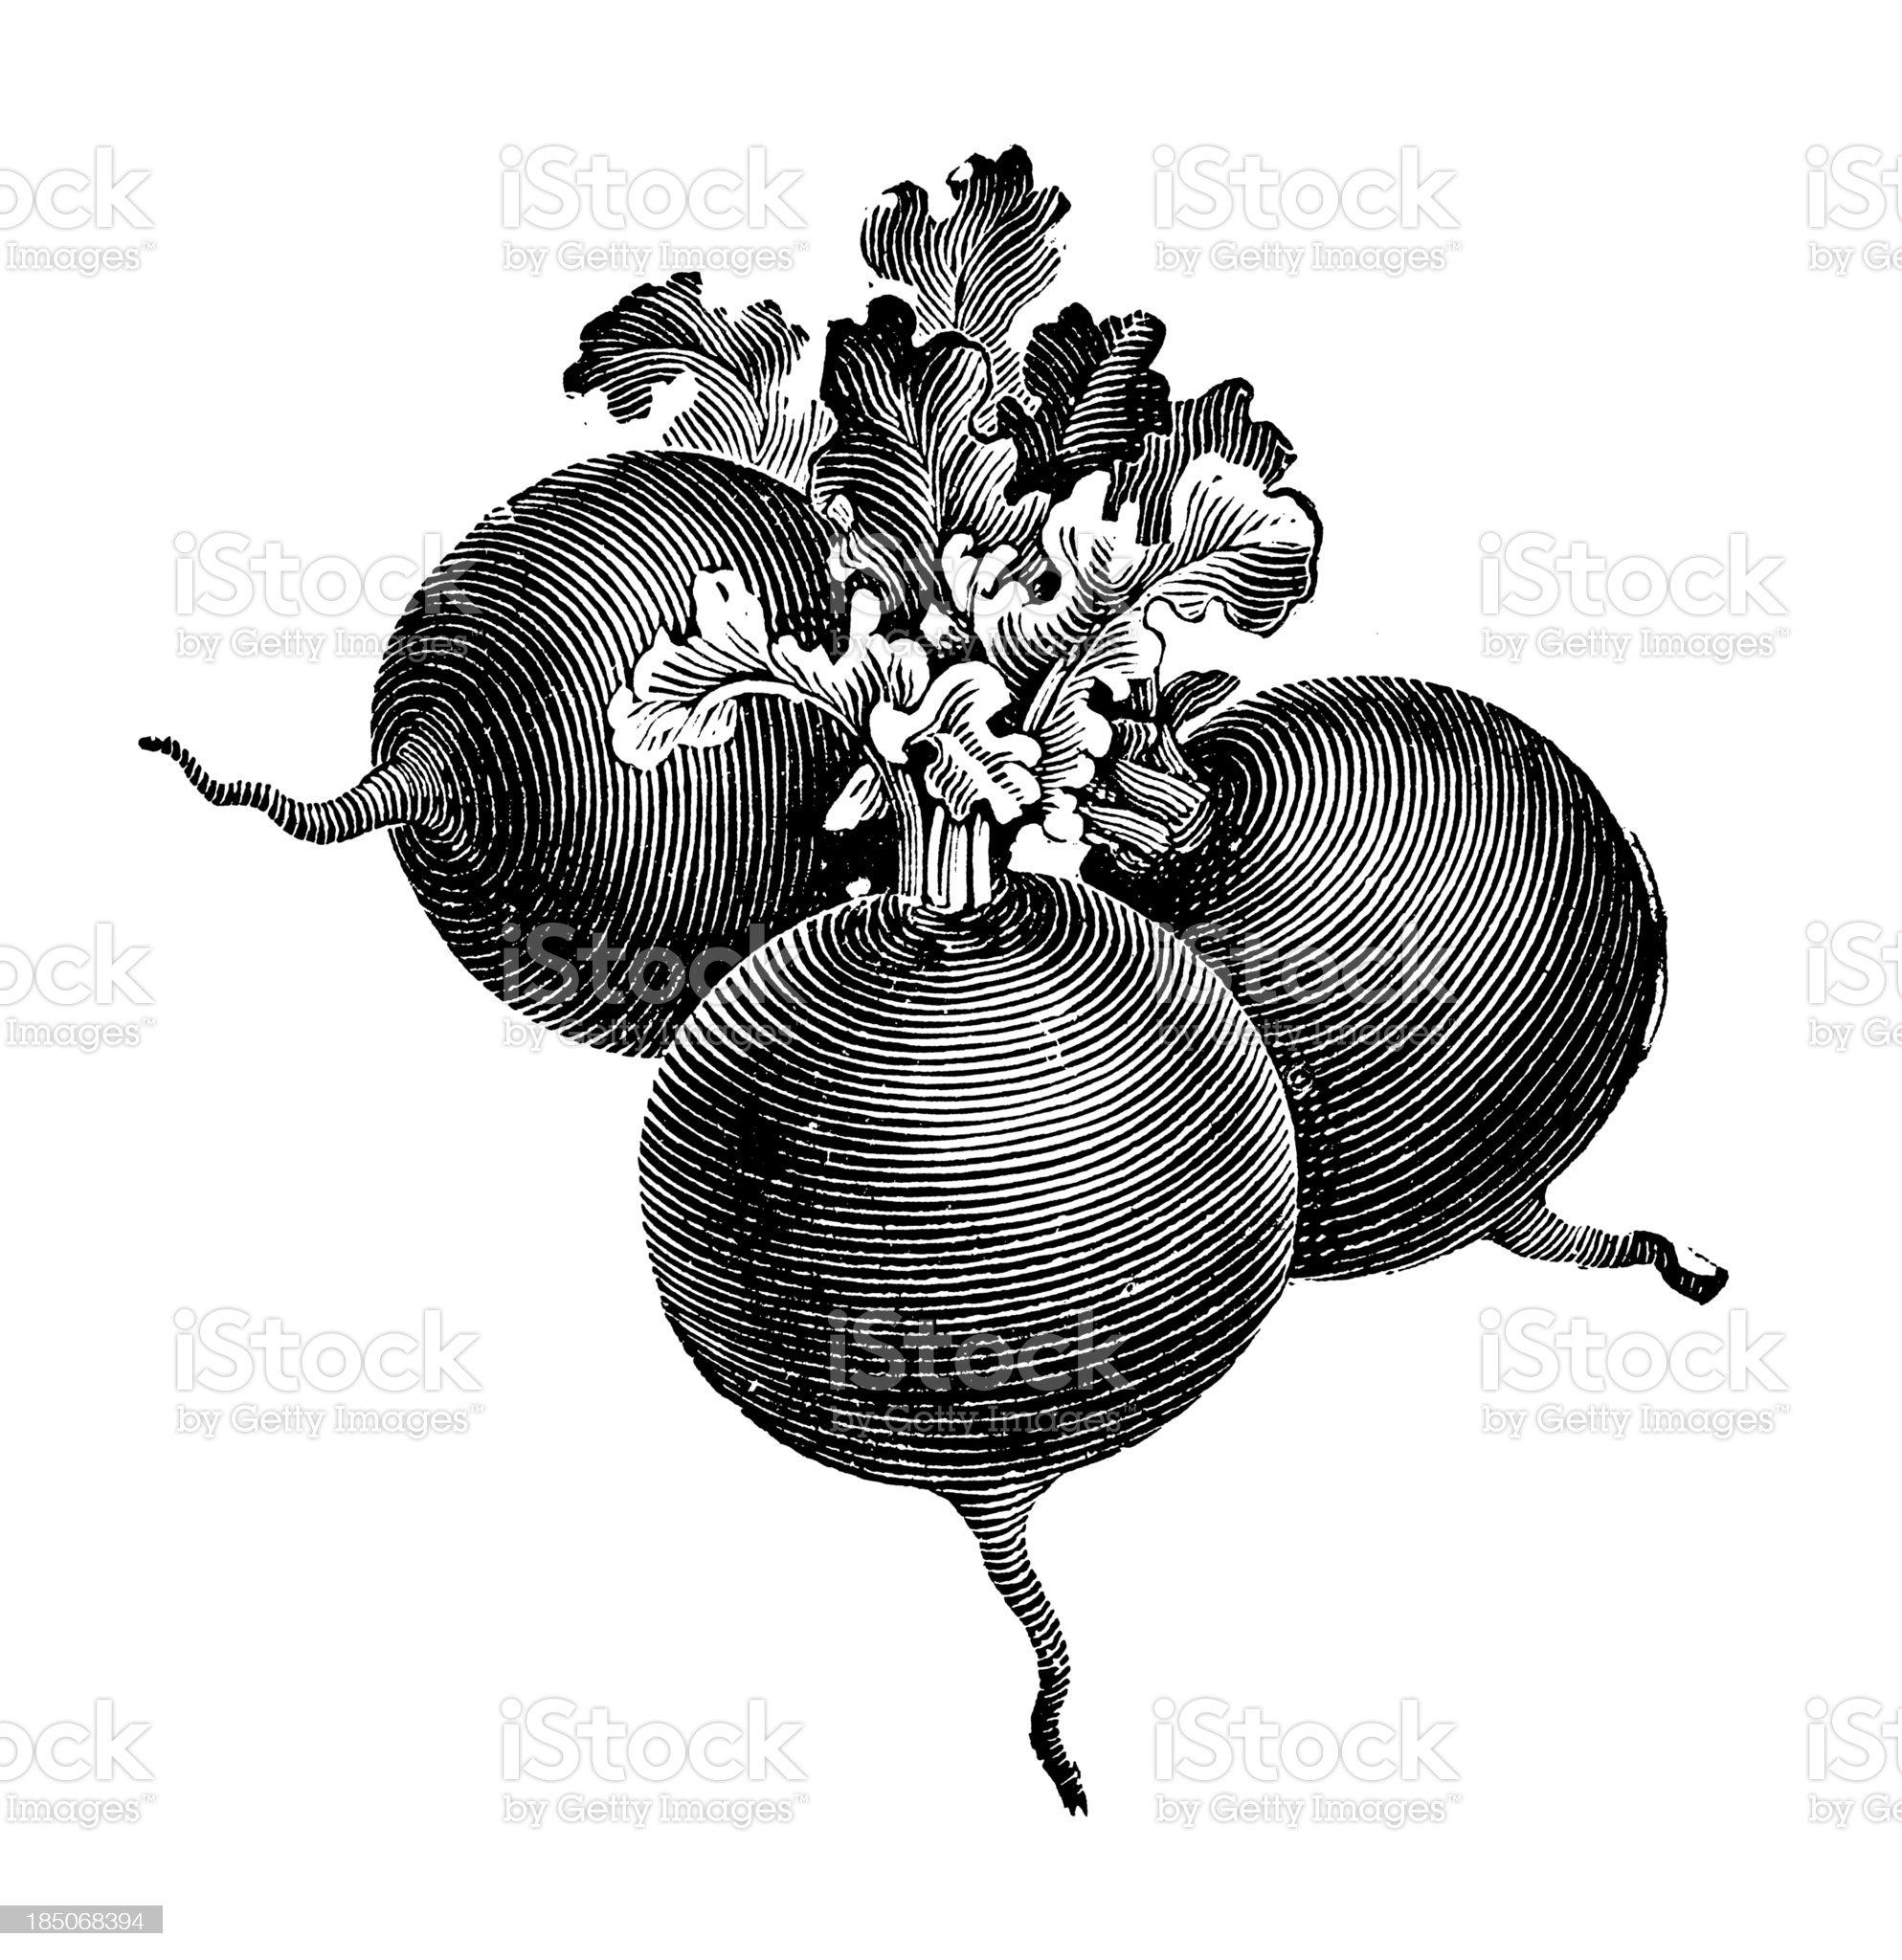 Globe Radish Illustration | Vintage Farmer Garden Vegetable Clipart royalty-free stock vector art